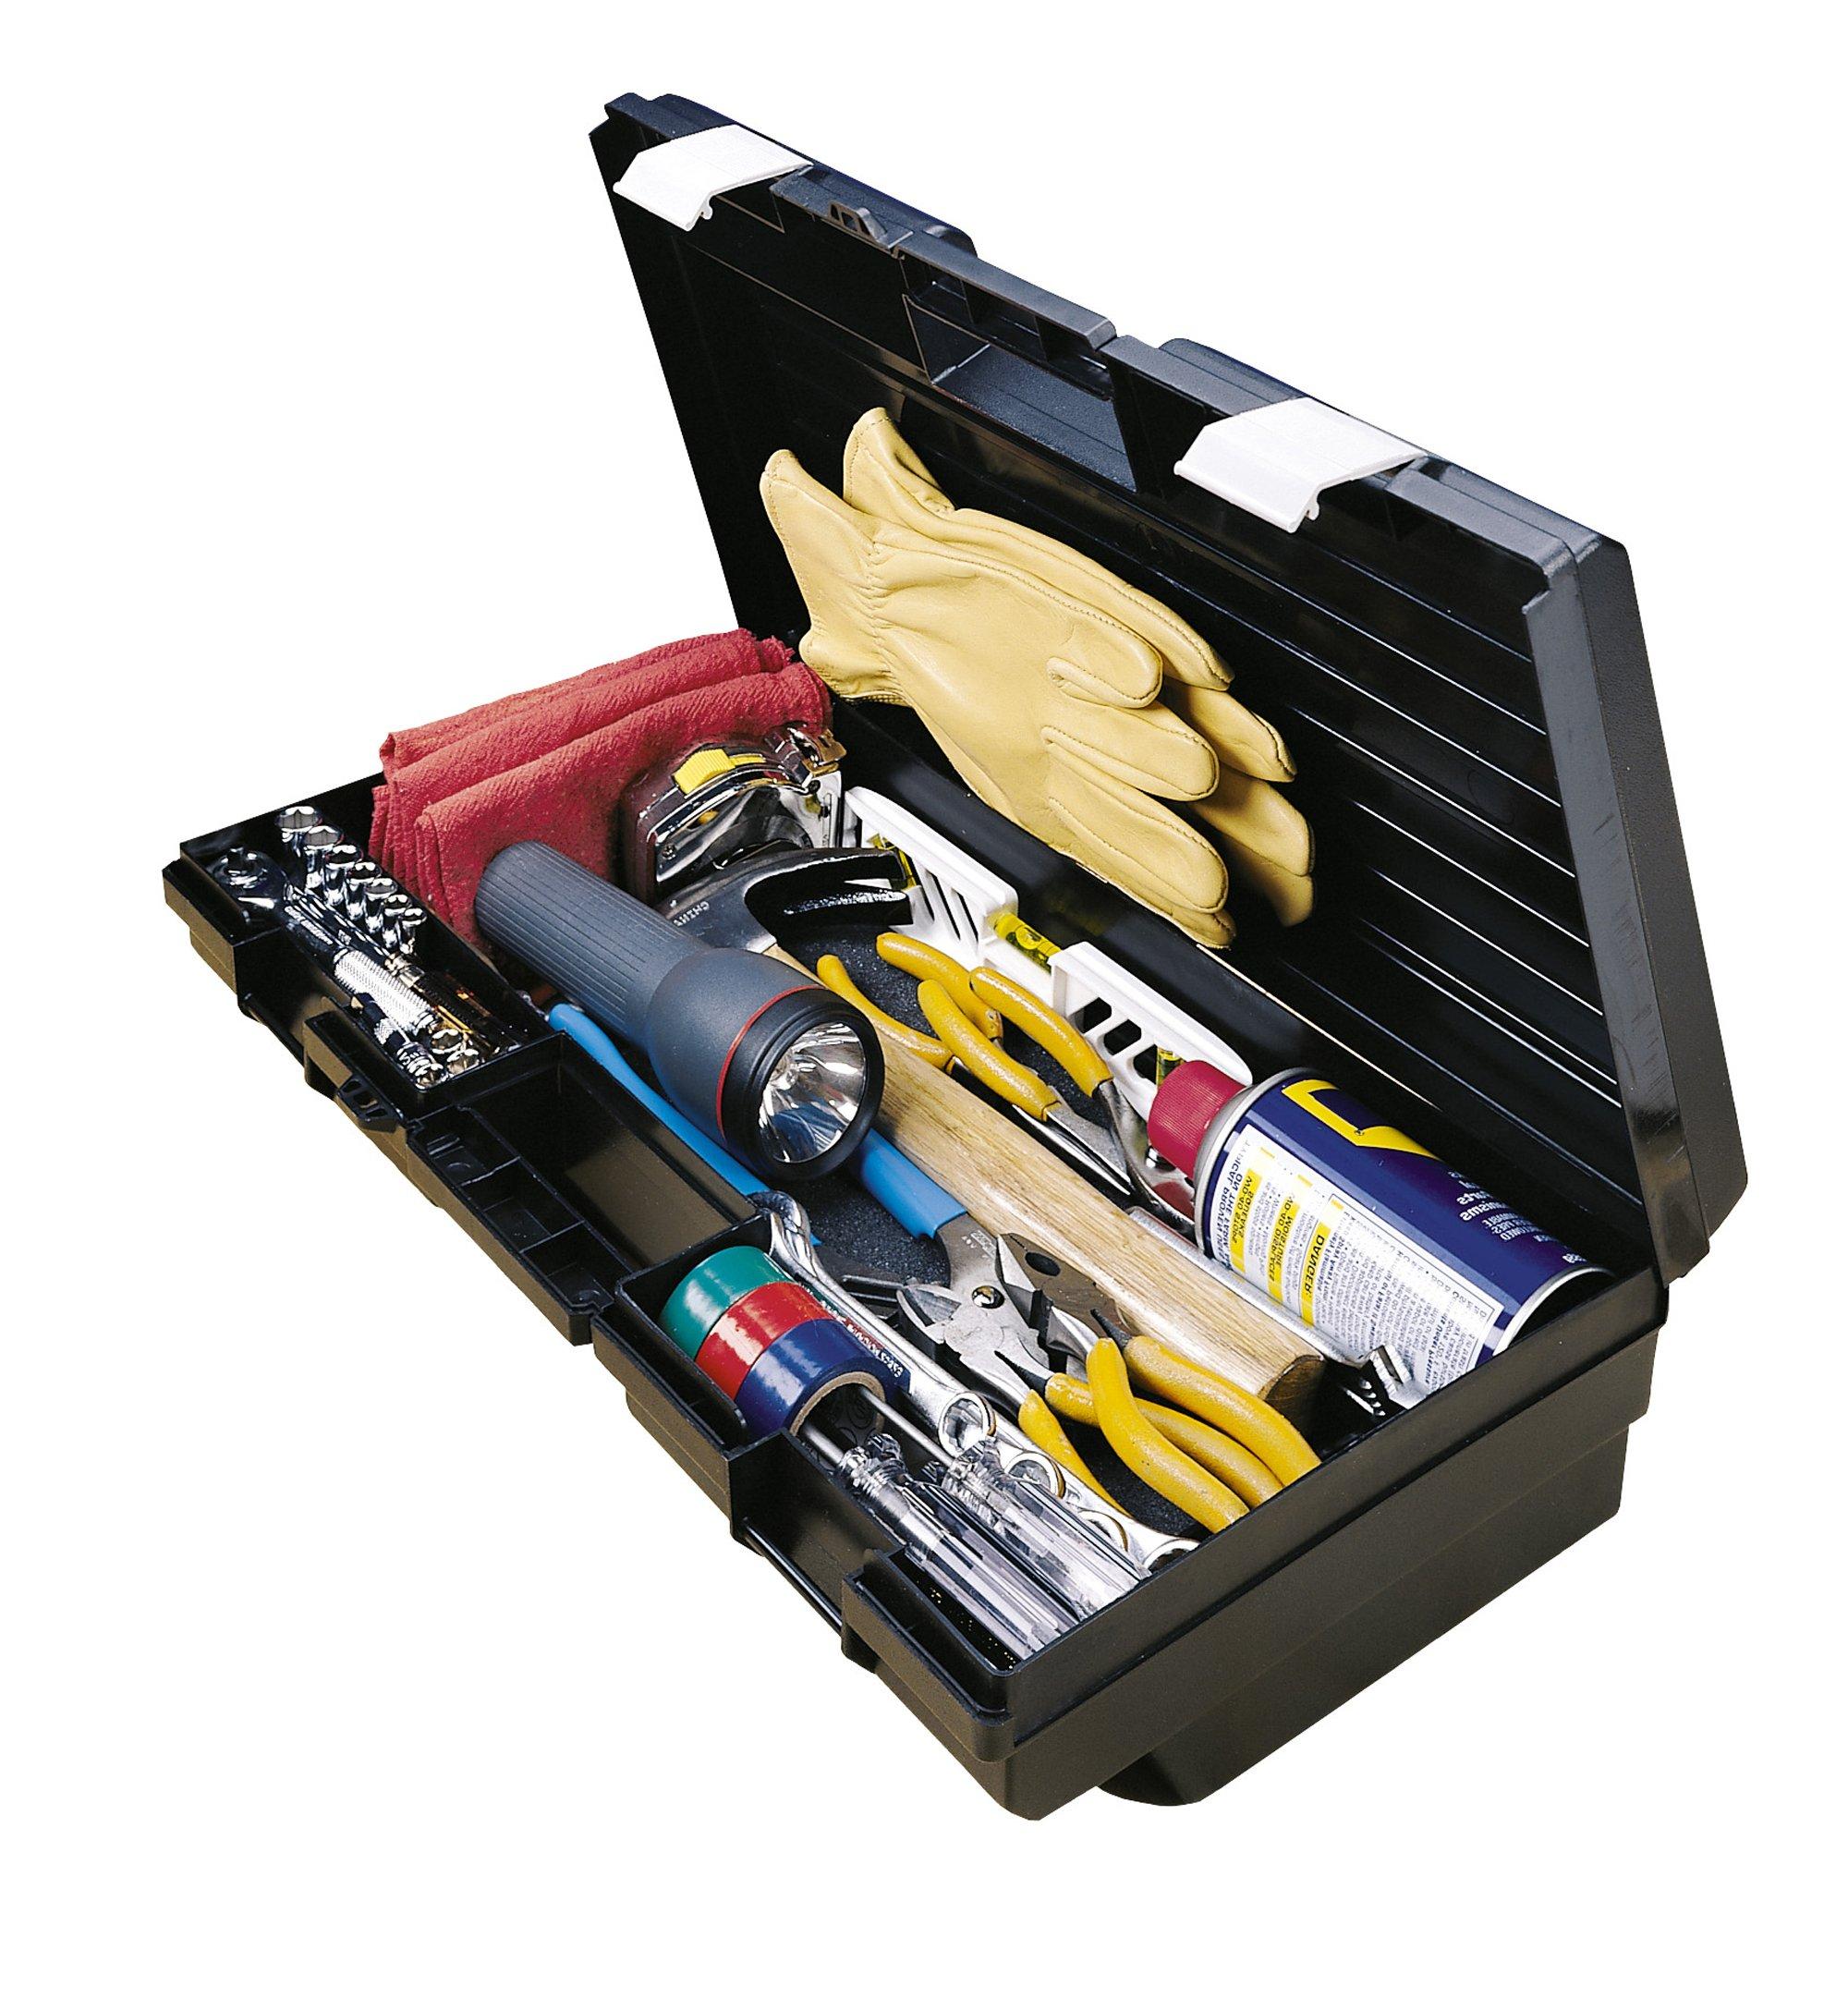 Stack-On RB-19N 19-Inch Multi-Purpose Slim Line Tool Box, Black